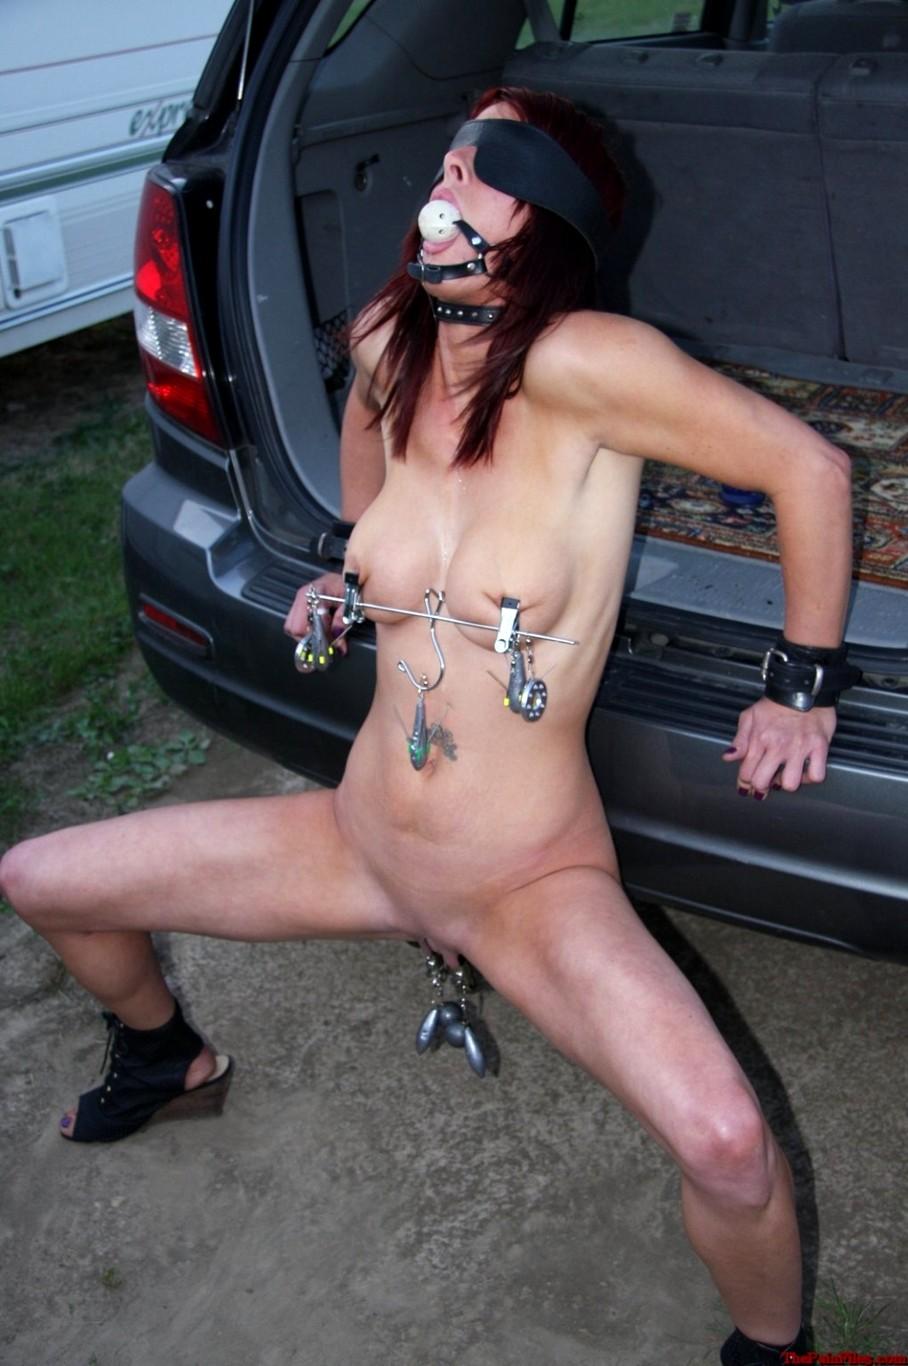 Tit torture porn pics